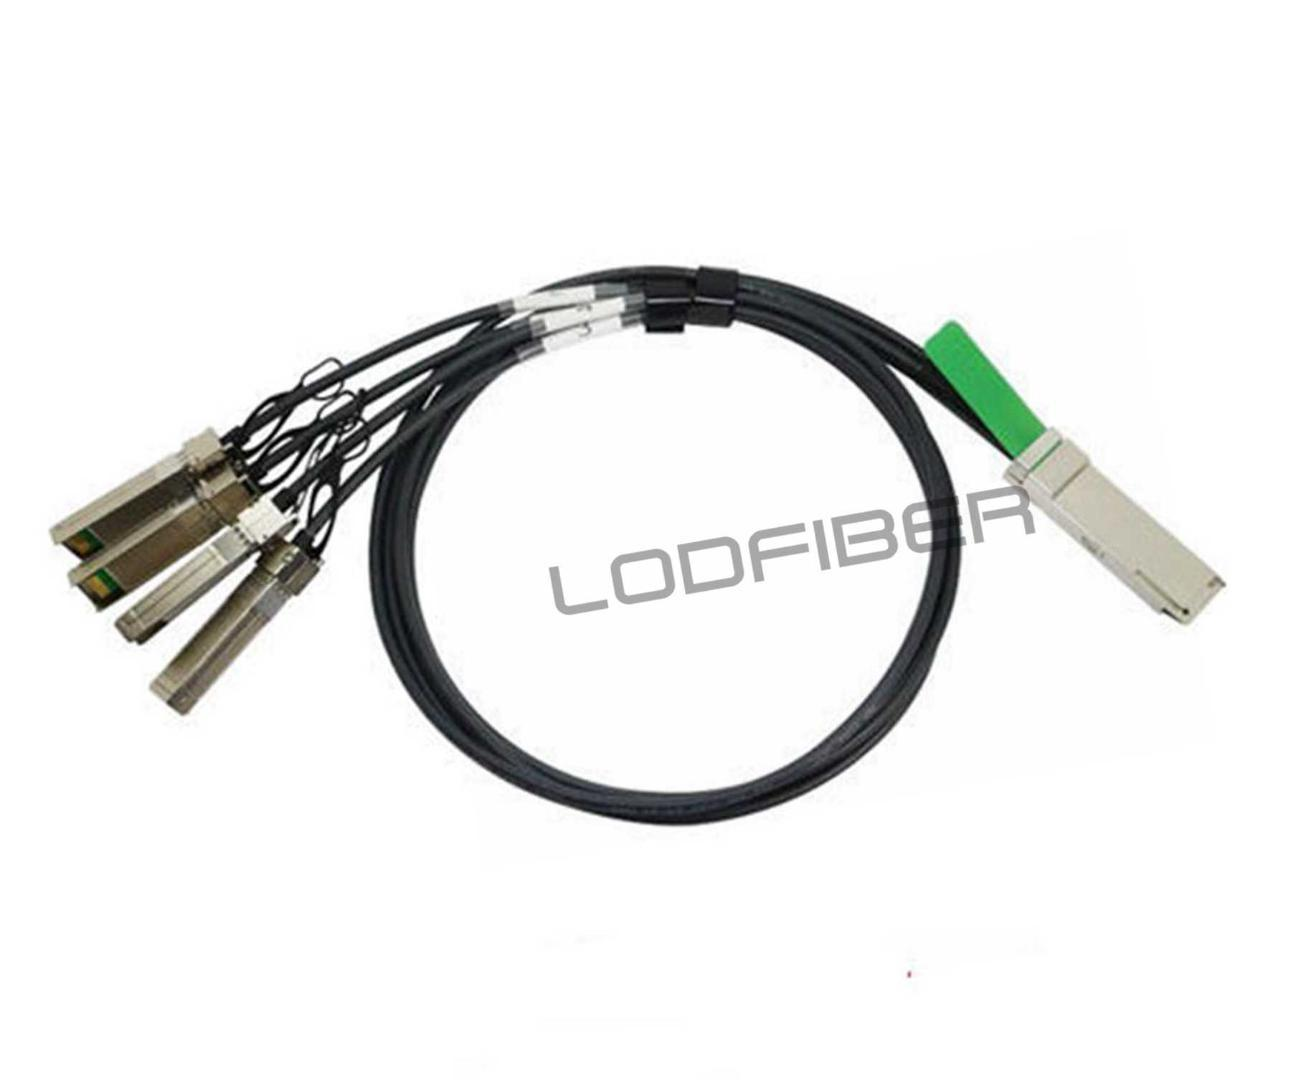 LODFIBER 2m (7ft) JNP-100G-4X25G-2M Compatible 100G QSFP28 to 4x25G SFP28  Passive Direct Attach Copper Breakout Cable